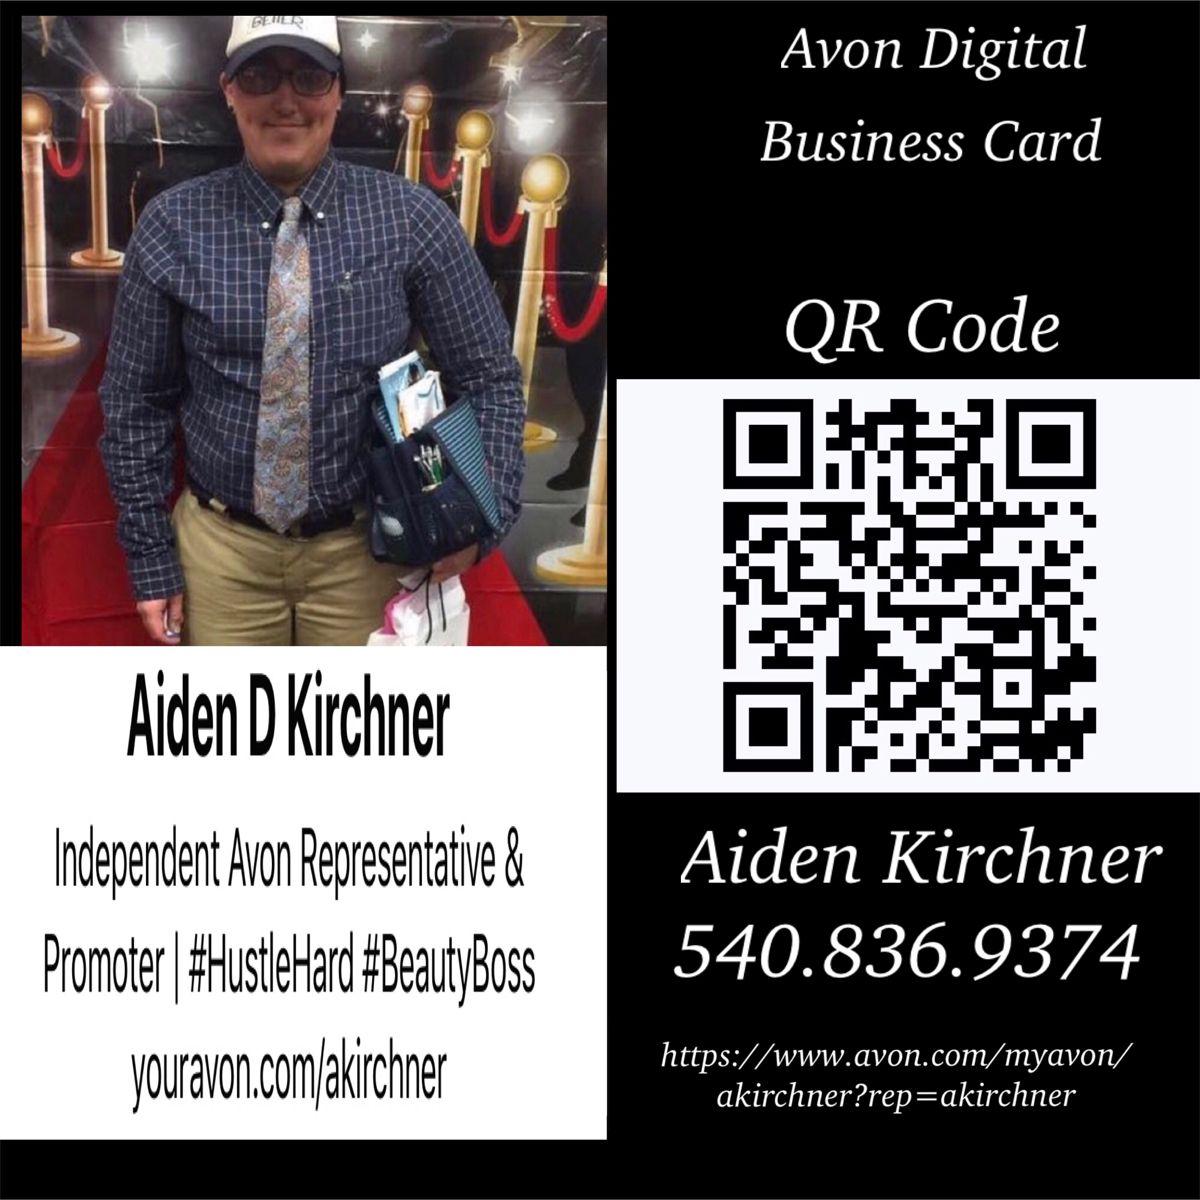 My avon digital business card digital business card